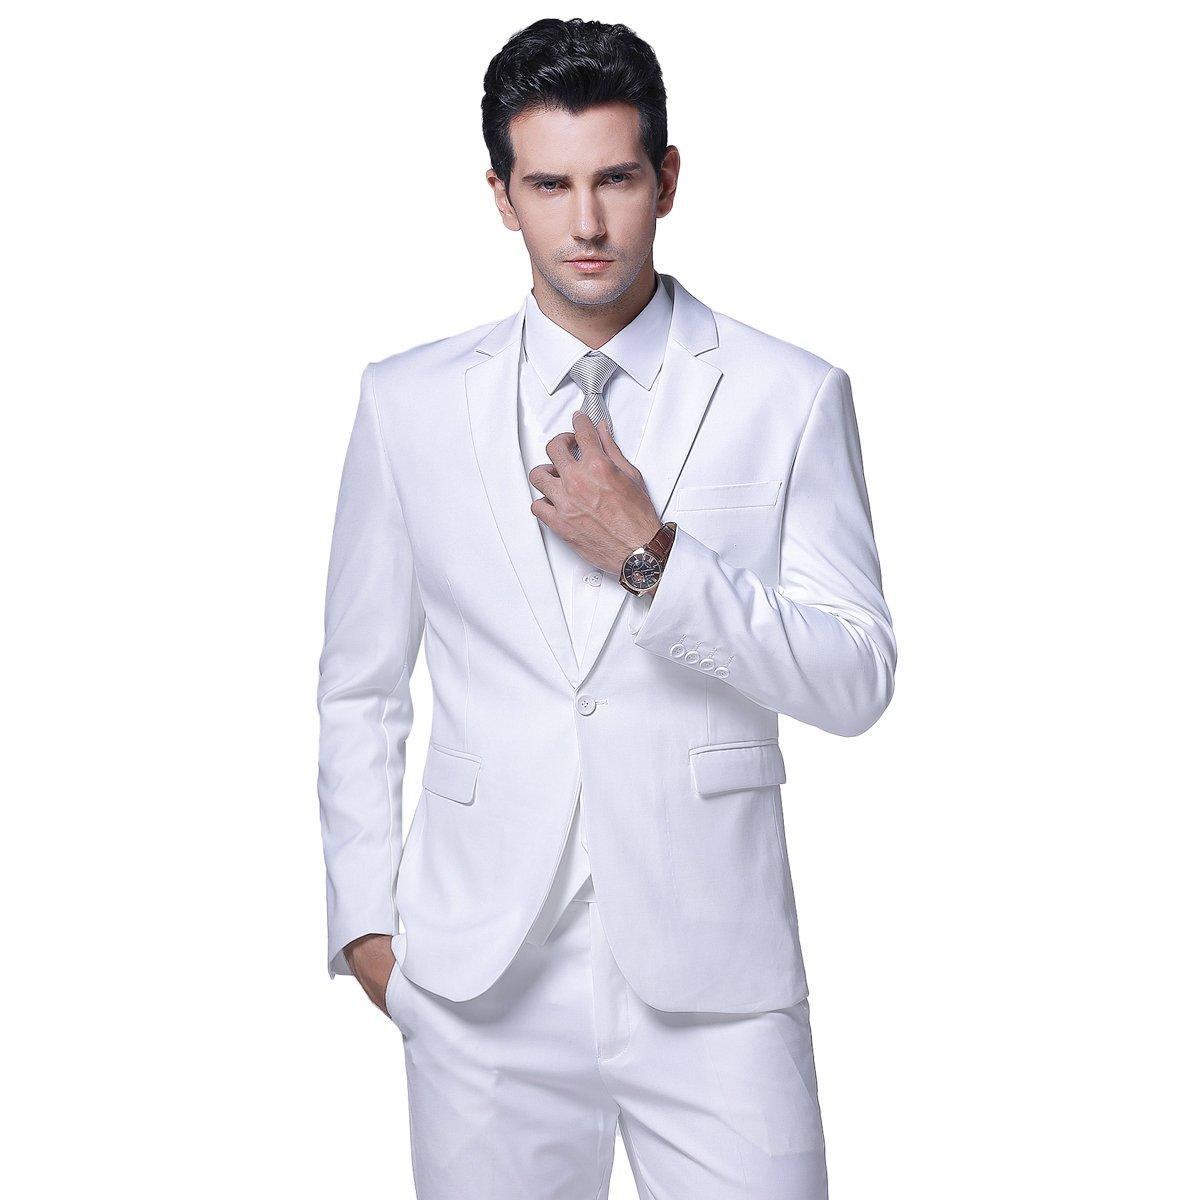 YFFUSHI Mens One Button Formal 2 Piece Suits Slim Fit Multi-Color Wedding Tuxedo